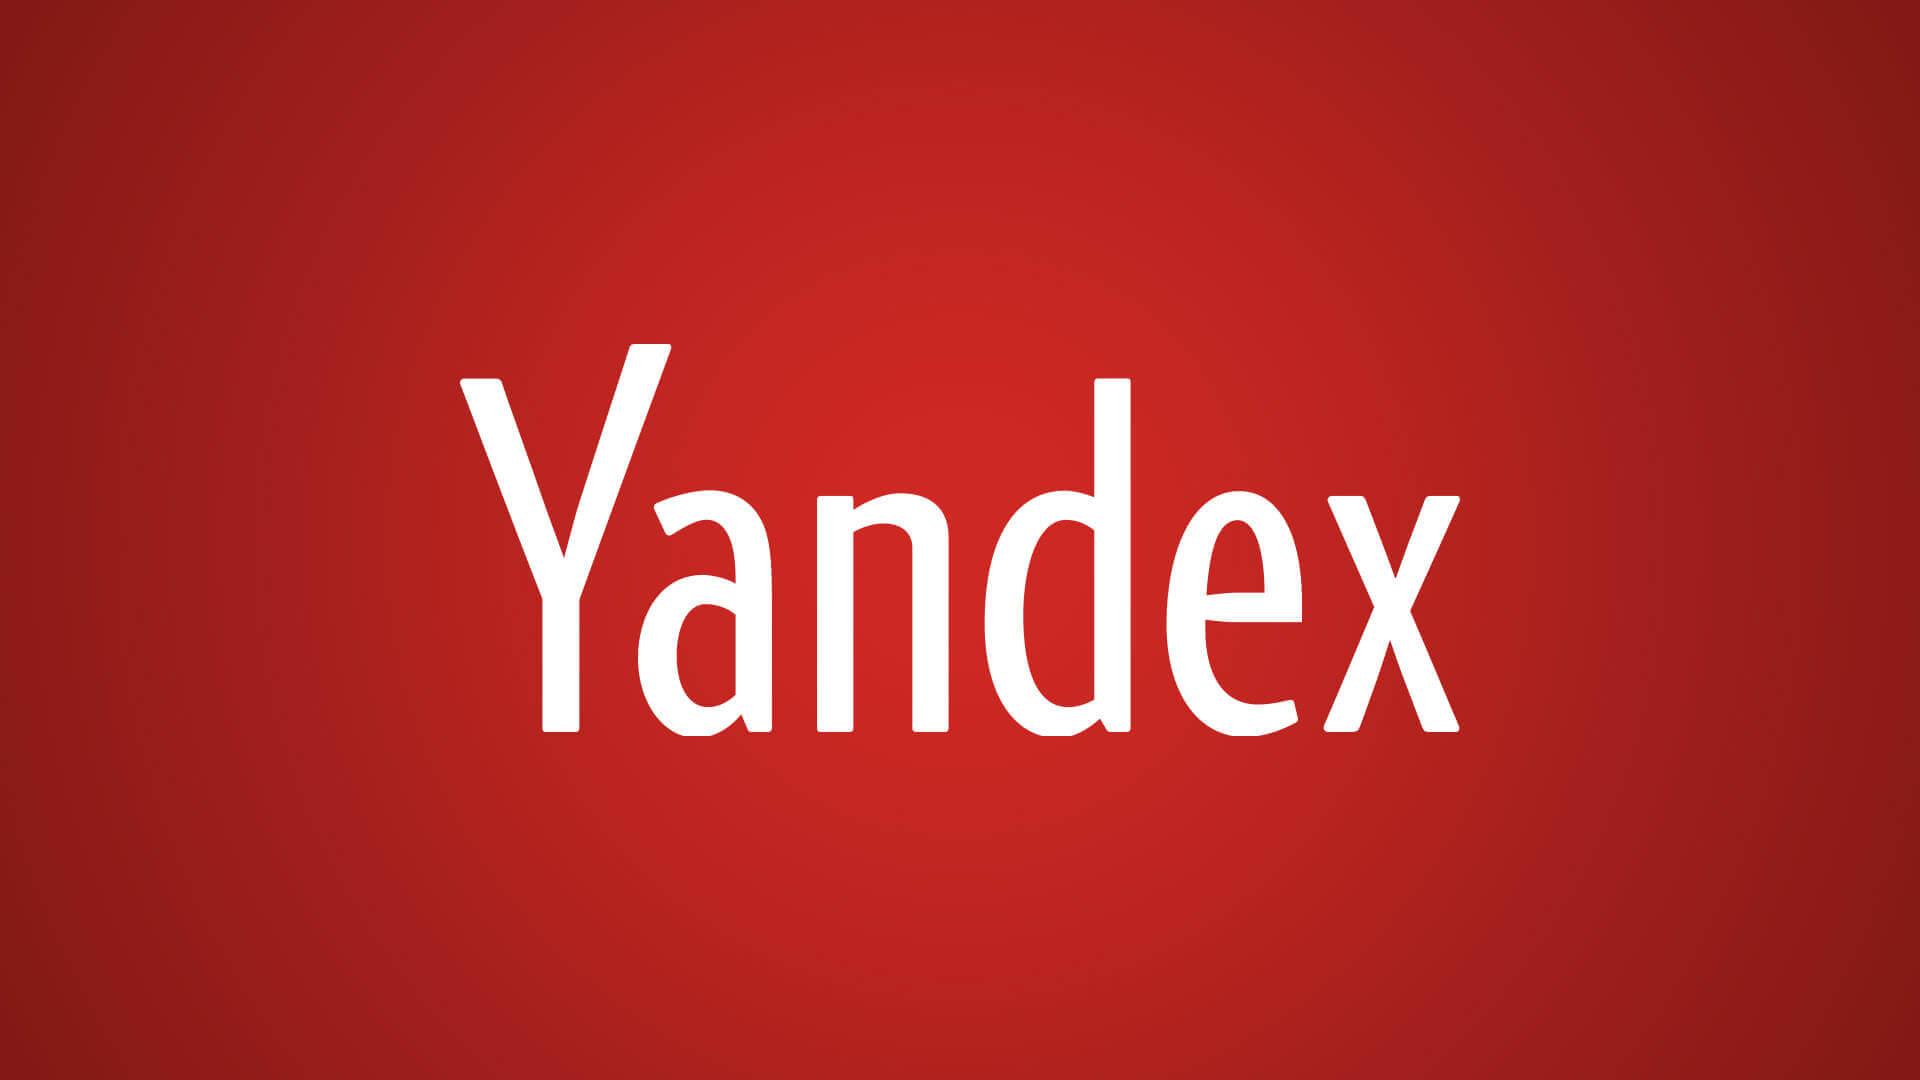 Яндекс: работа над ошибками